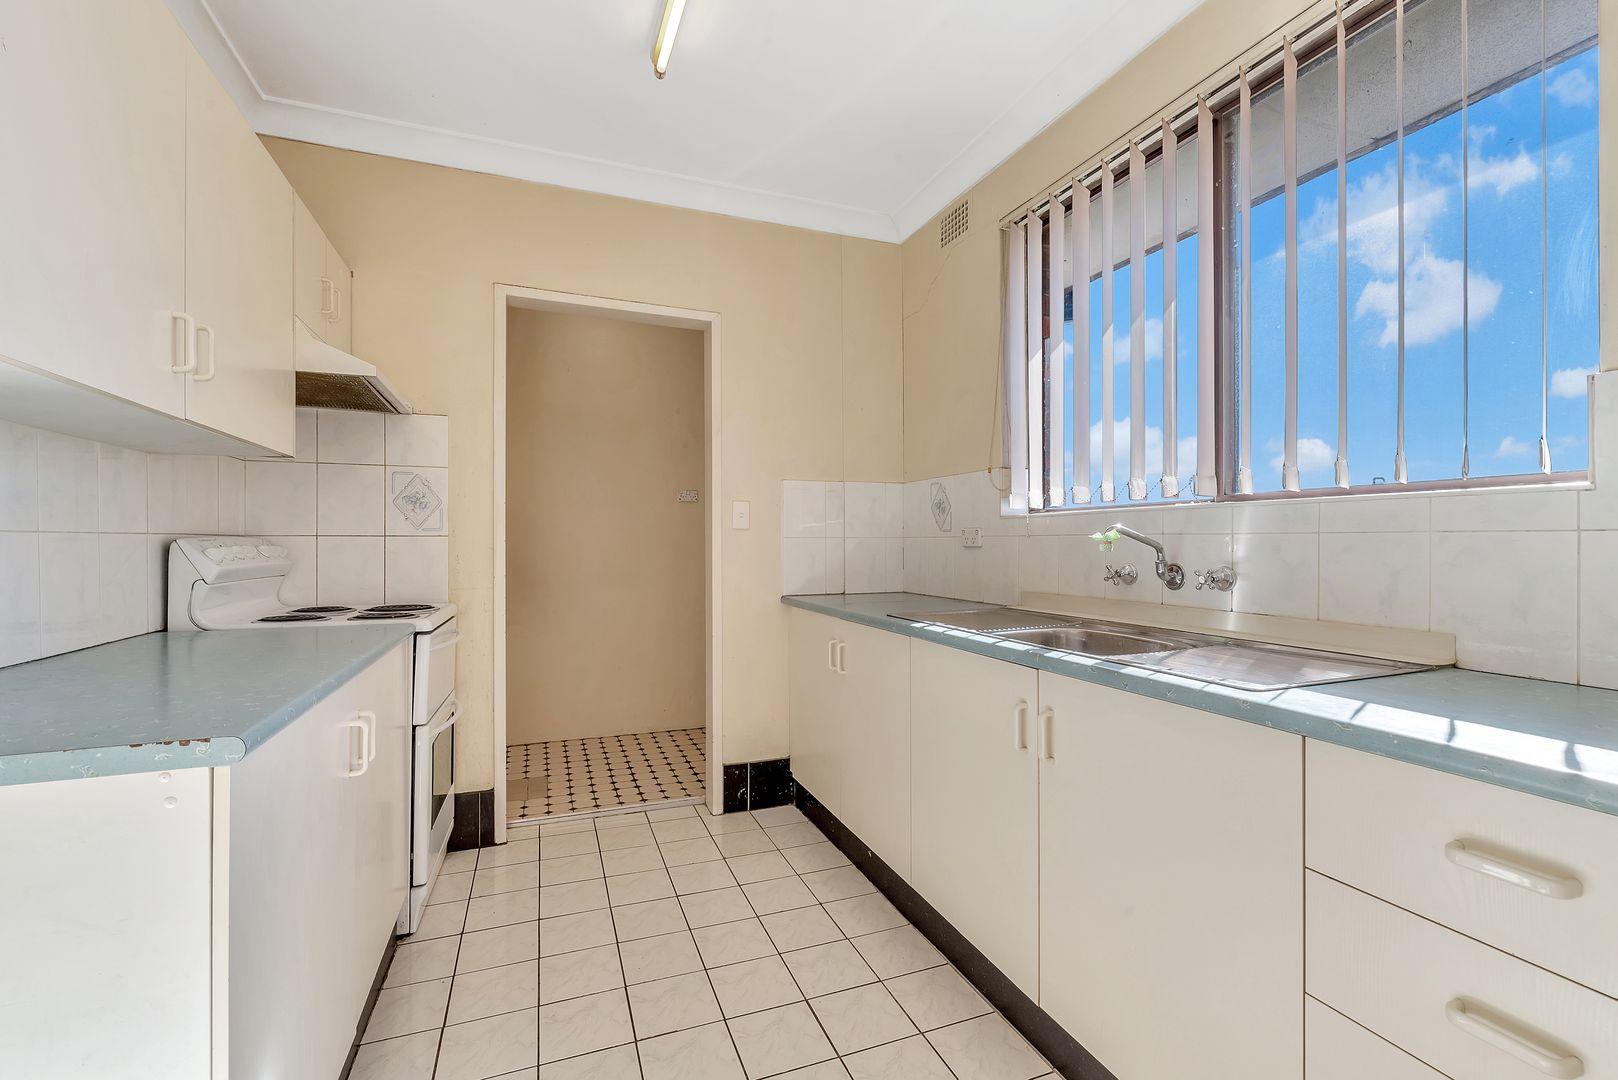 46/73 Mcburney Road, Cabramatta NSW 2166, Image 1